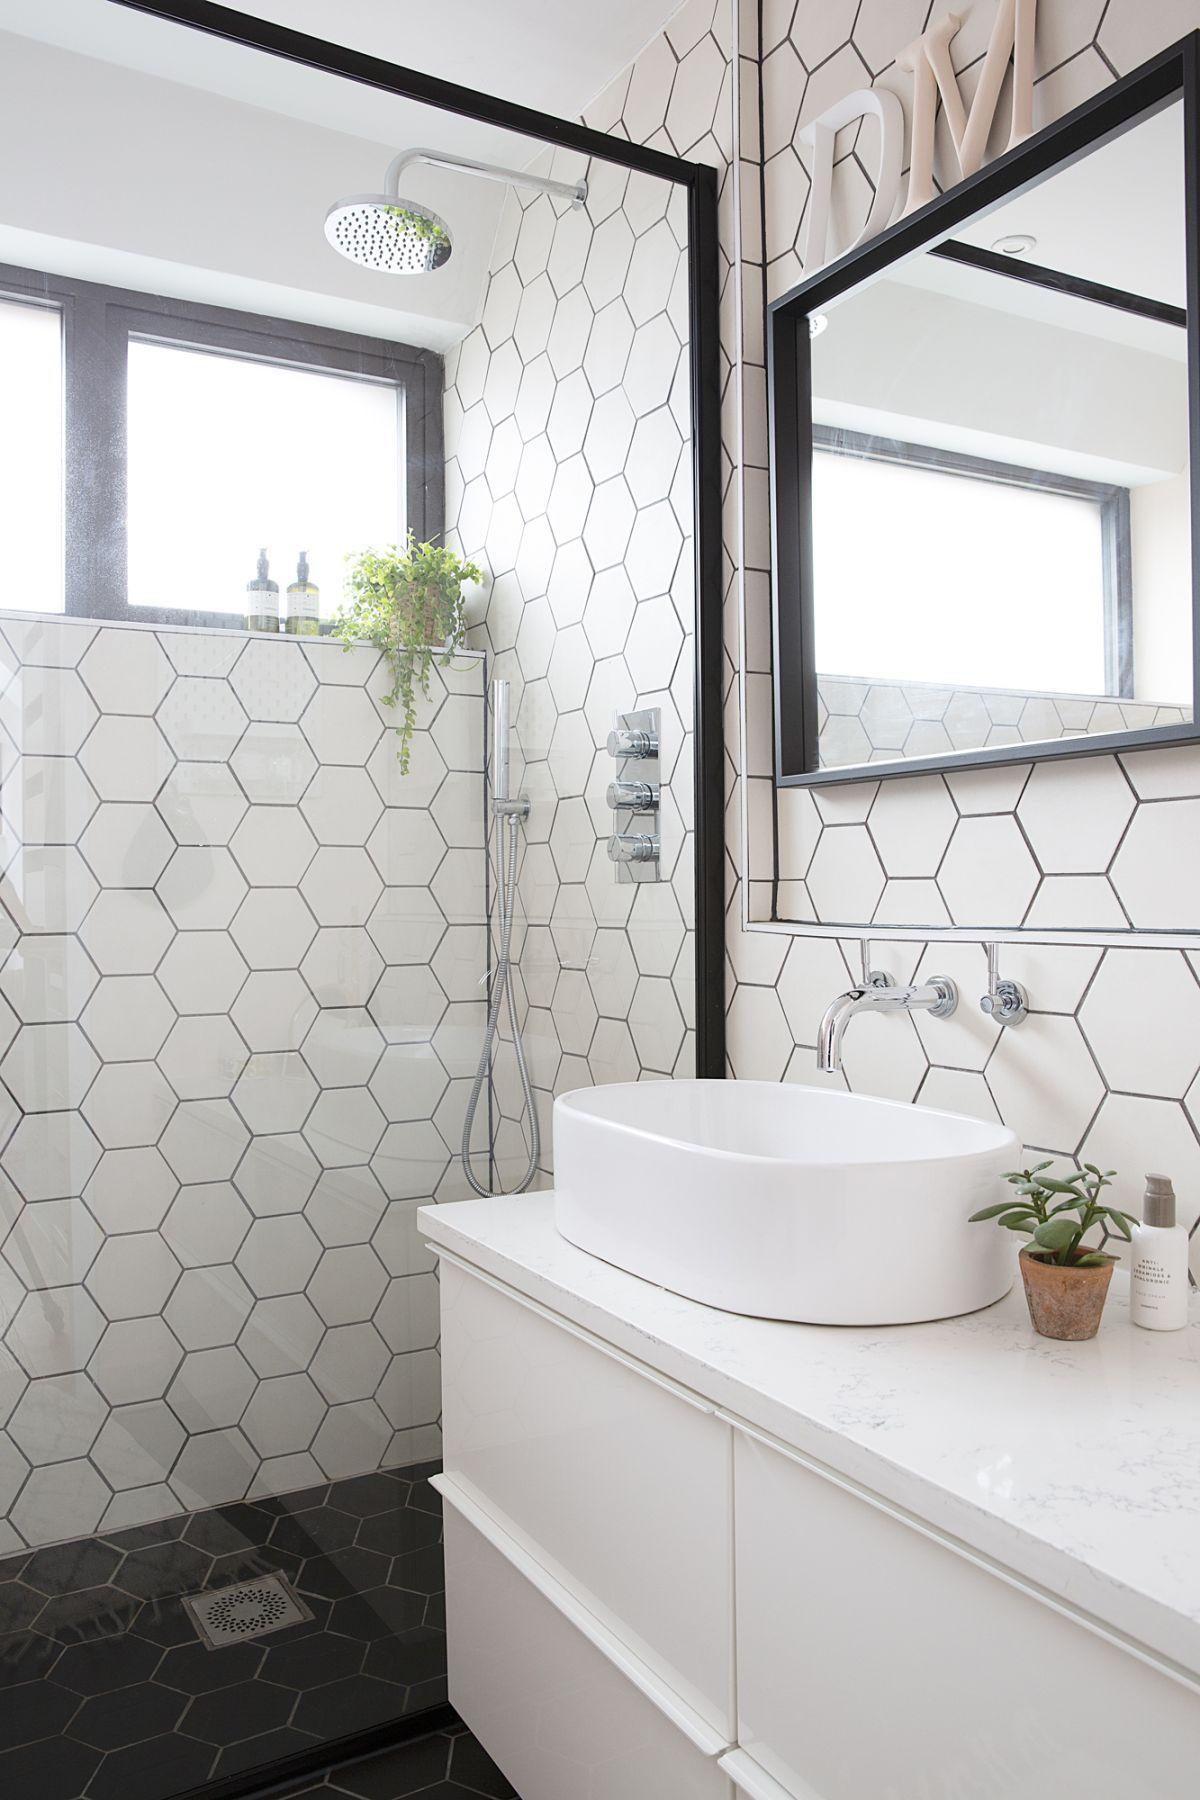 Small bathroom design in 2020 | Simple bathroom, Bathroom ...